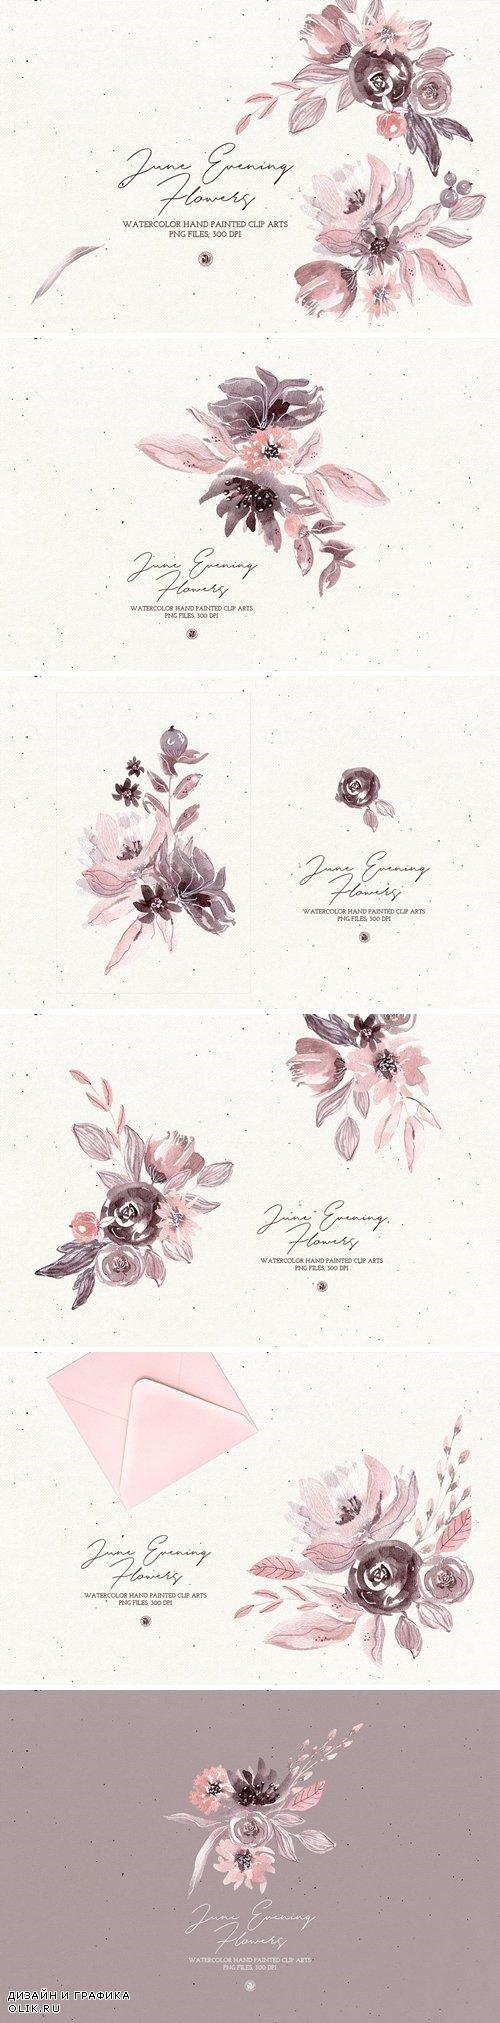 June Evening Flowers - 3891077